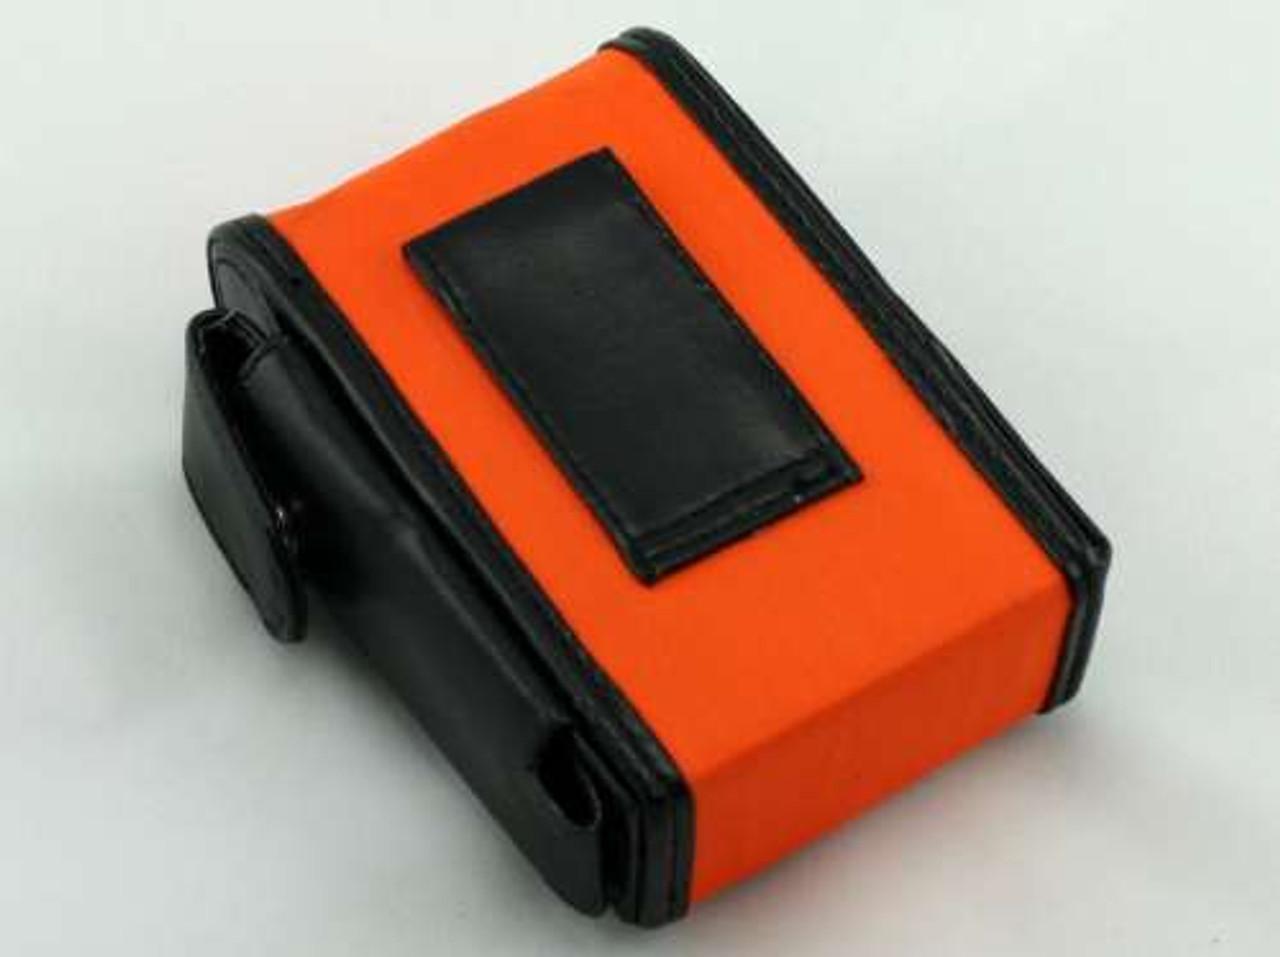 Orange Flip Cigarette Pack Holder